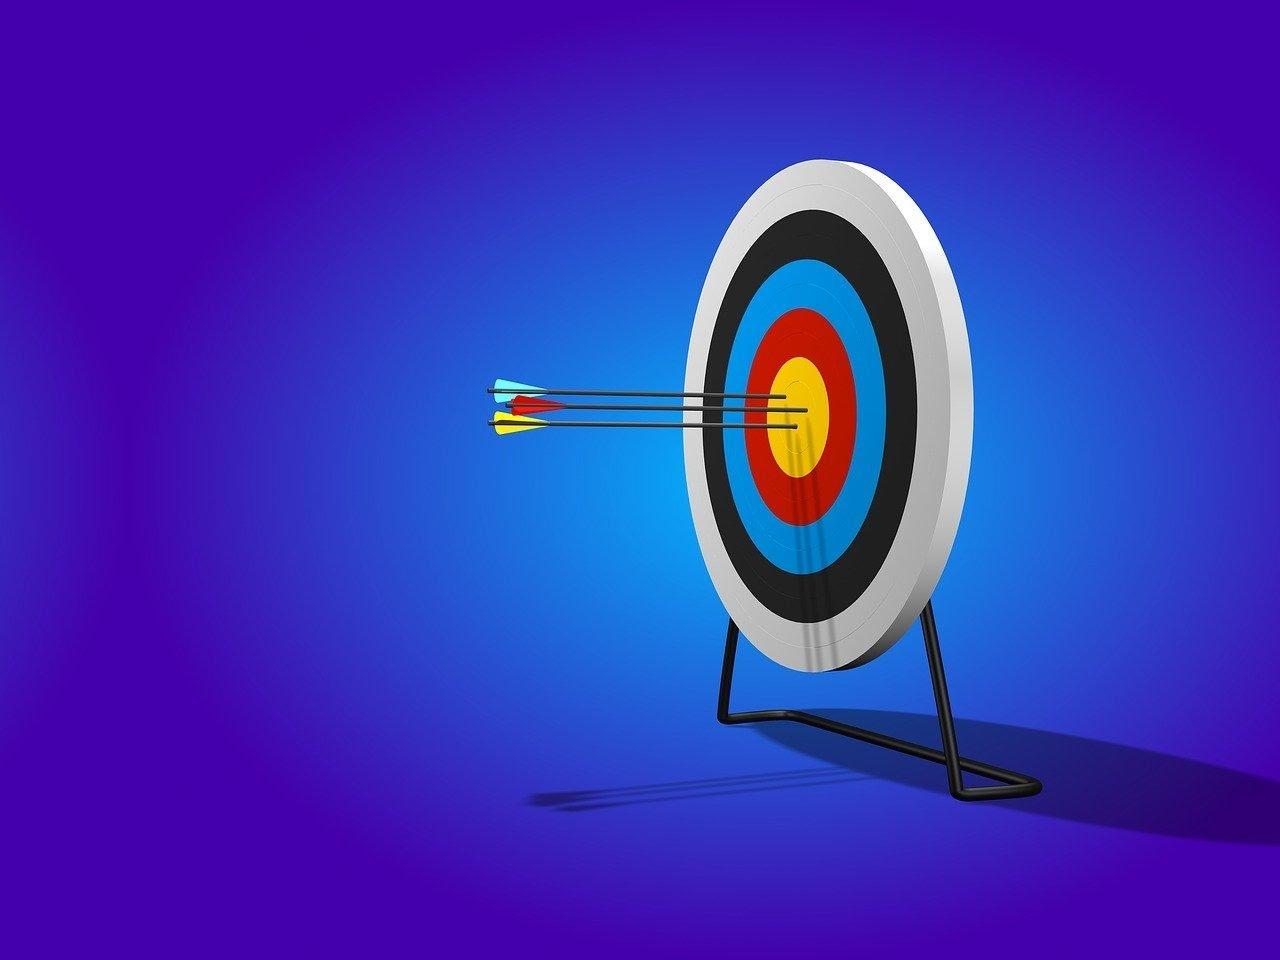 arrow-target-range-bullseye-sport-how to manage a team remotely